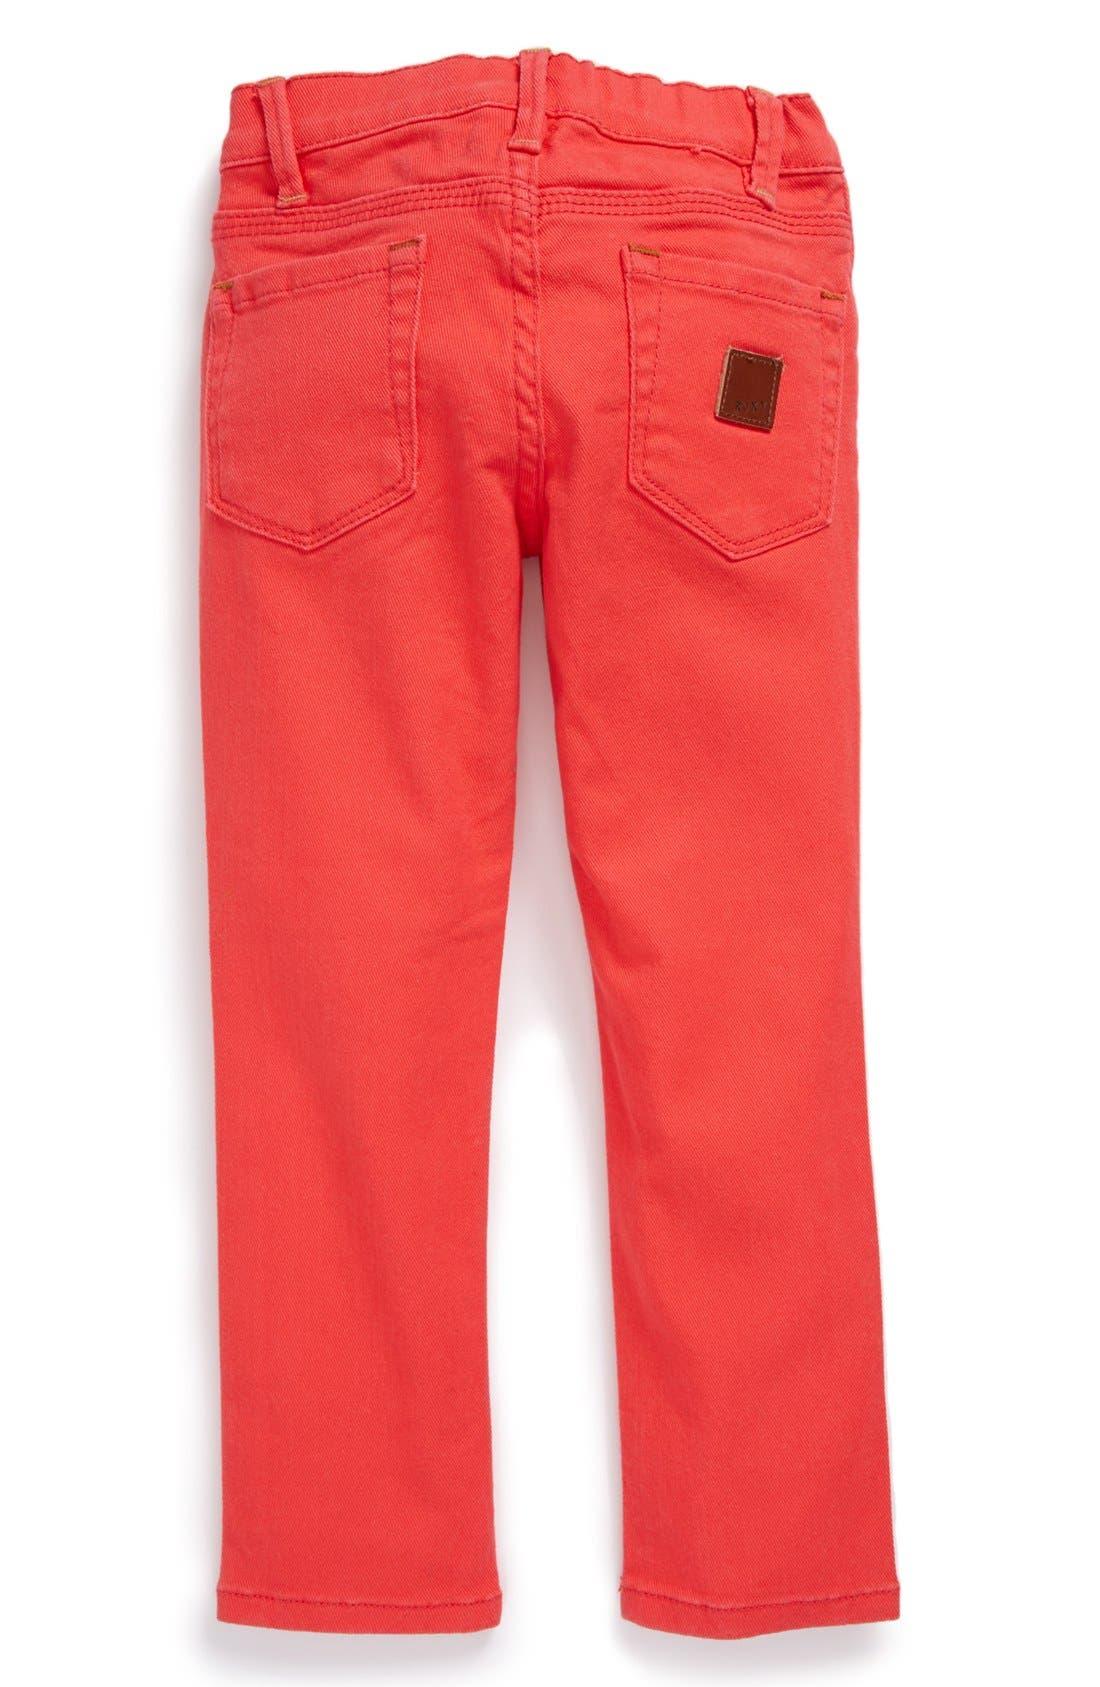 Main Image - Roxy 'Skinny Rails' Skinny Jeans (Little Girls)